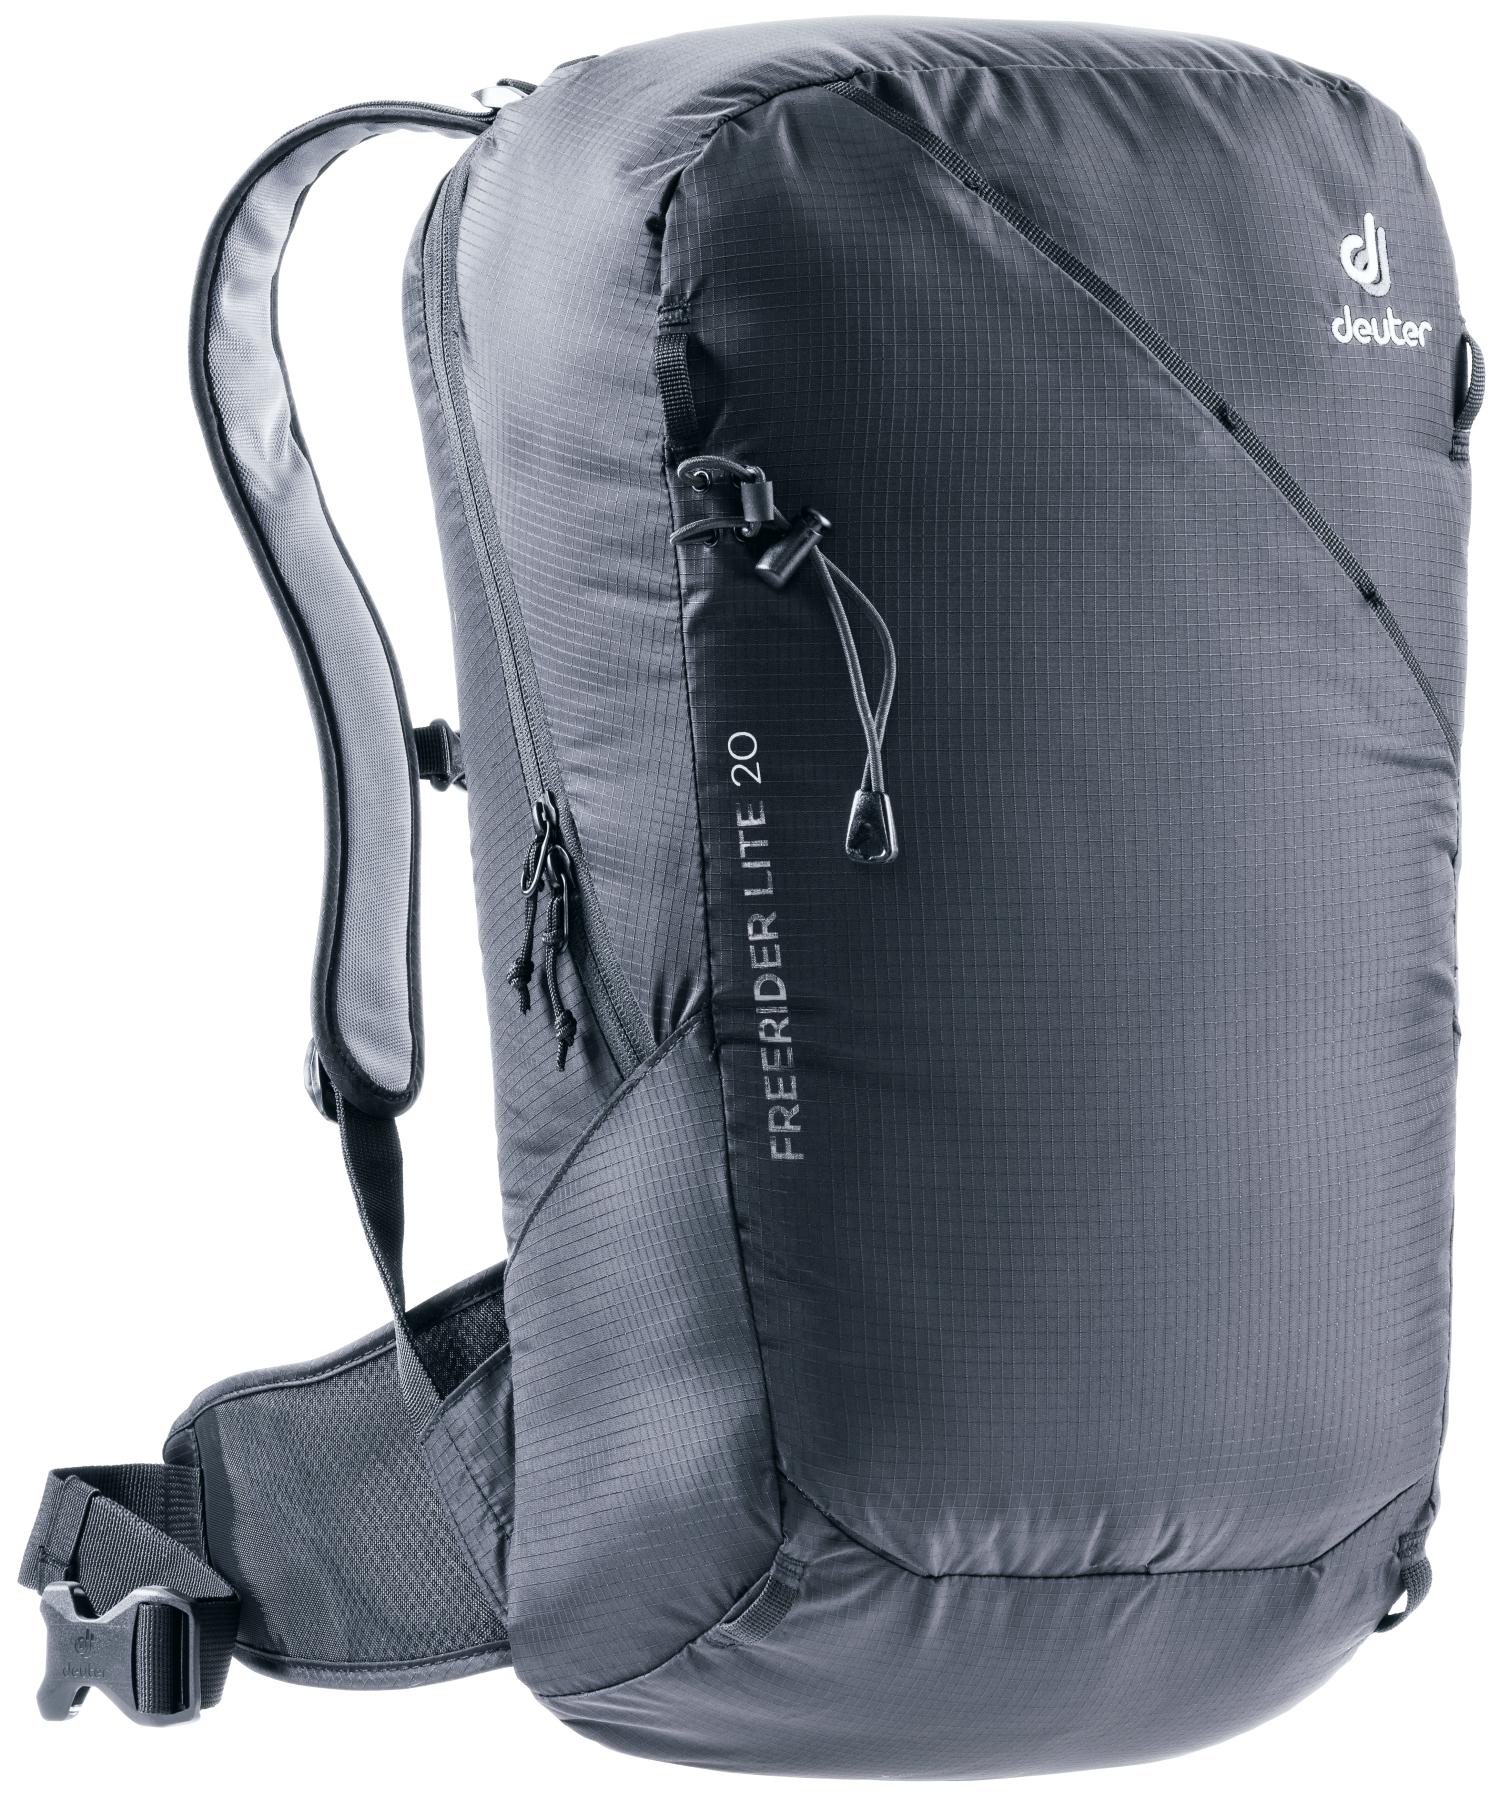 Рюкзаки для фрирайда Рюкзак сноубордический Deuter Freerider Lite 20 3303121-7000-FreeriderLite20-w20-d0.jpg